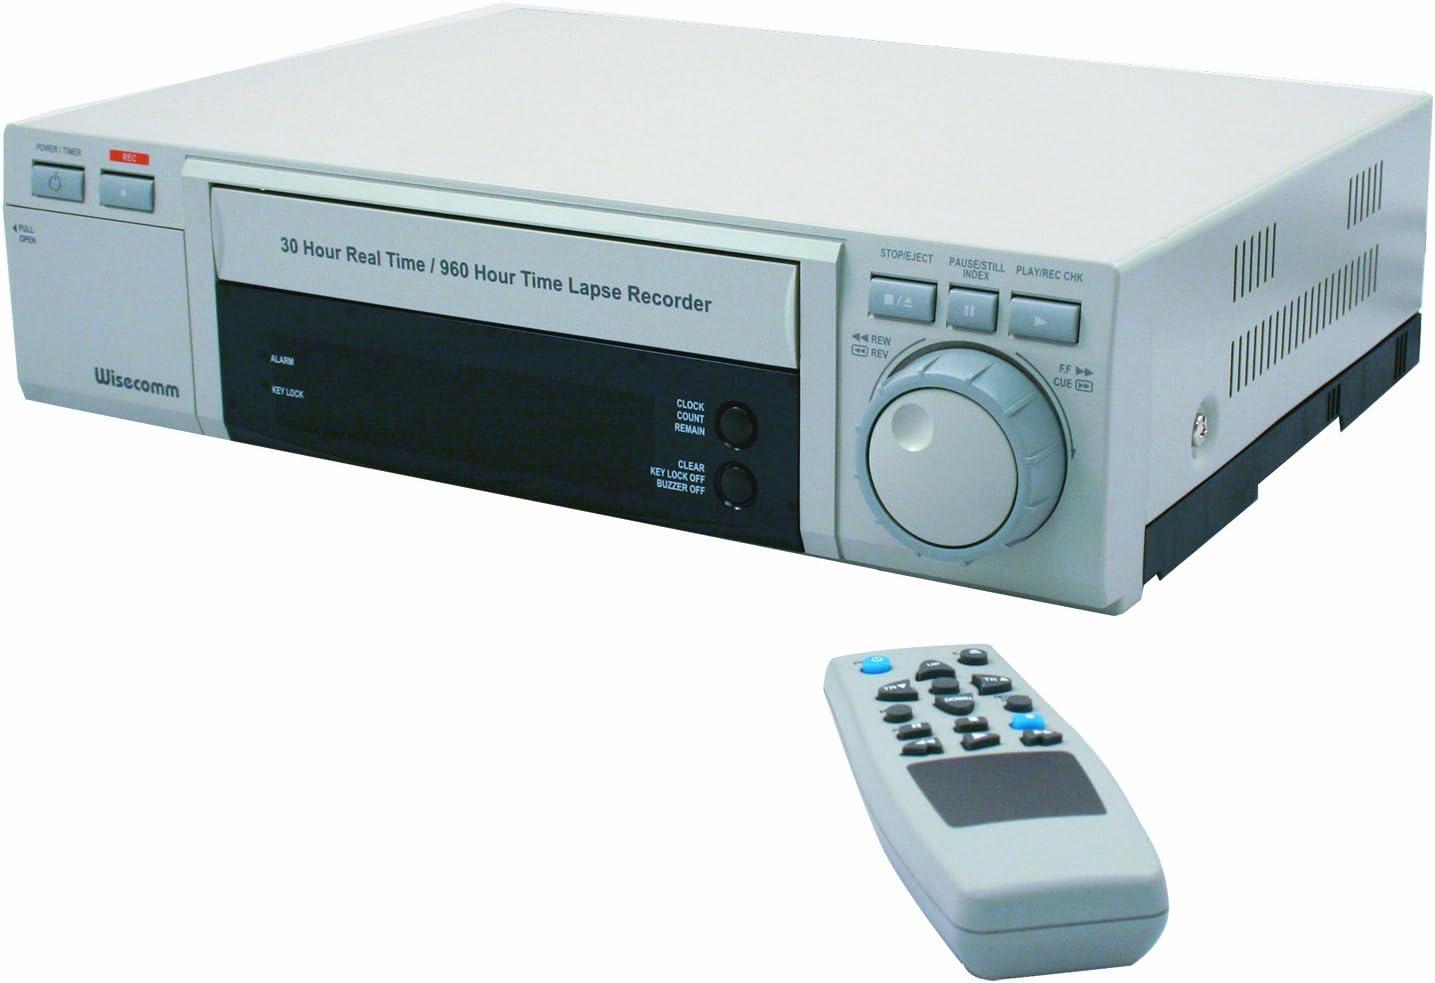 Wisecomm TLV1280A Surveillance Recorder - Medium (Light Grey)